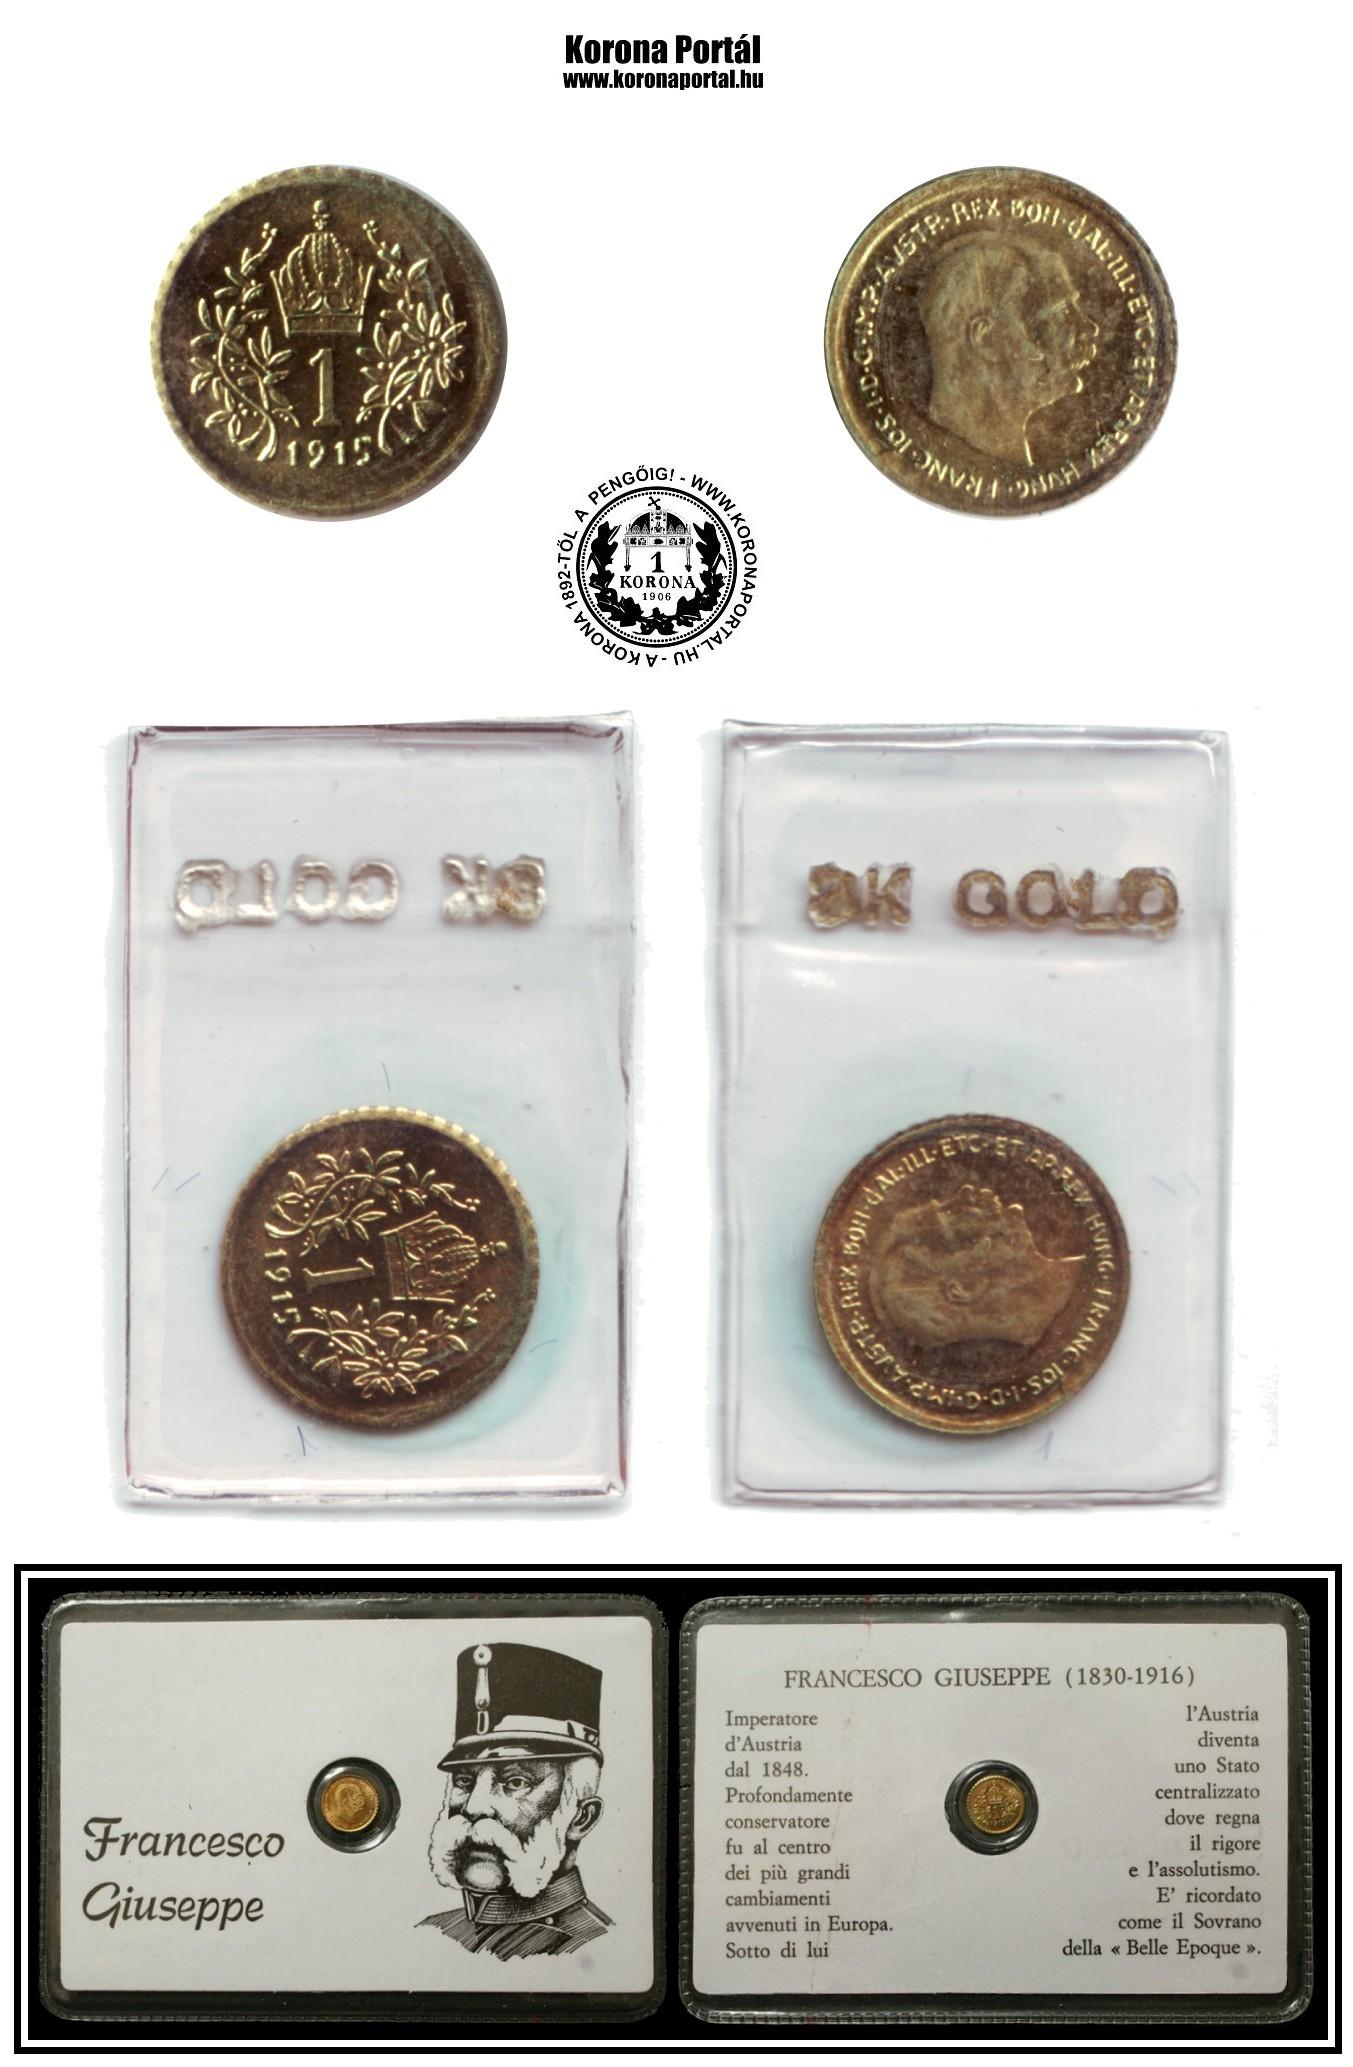 http://www.koronaportal.hu/ritkasagkatalogus/1_korona/www_koronaportal_hu_1915_1_arany-korona_mini_gold_10mm_osztrak.jpg